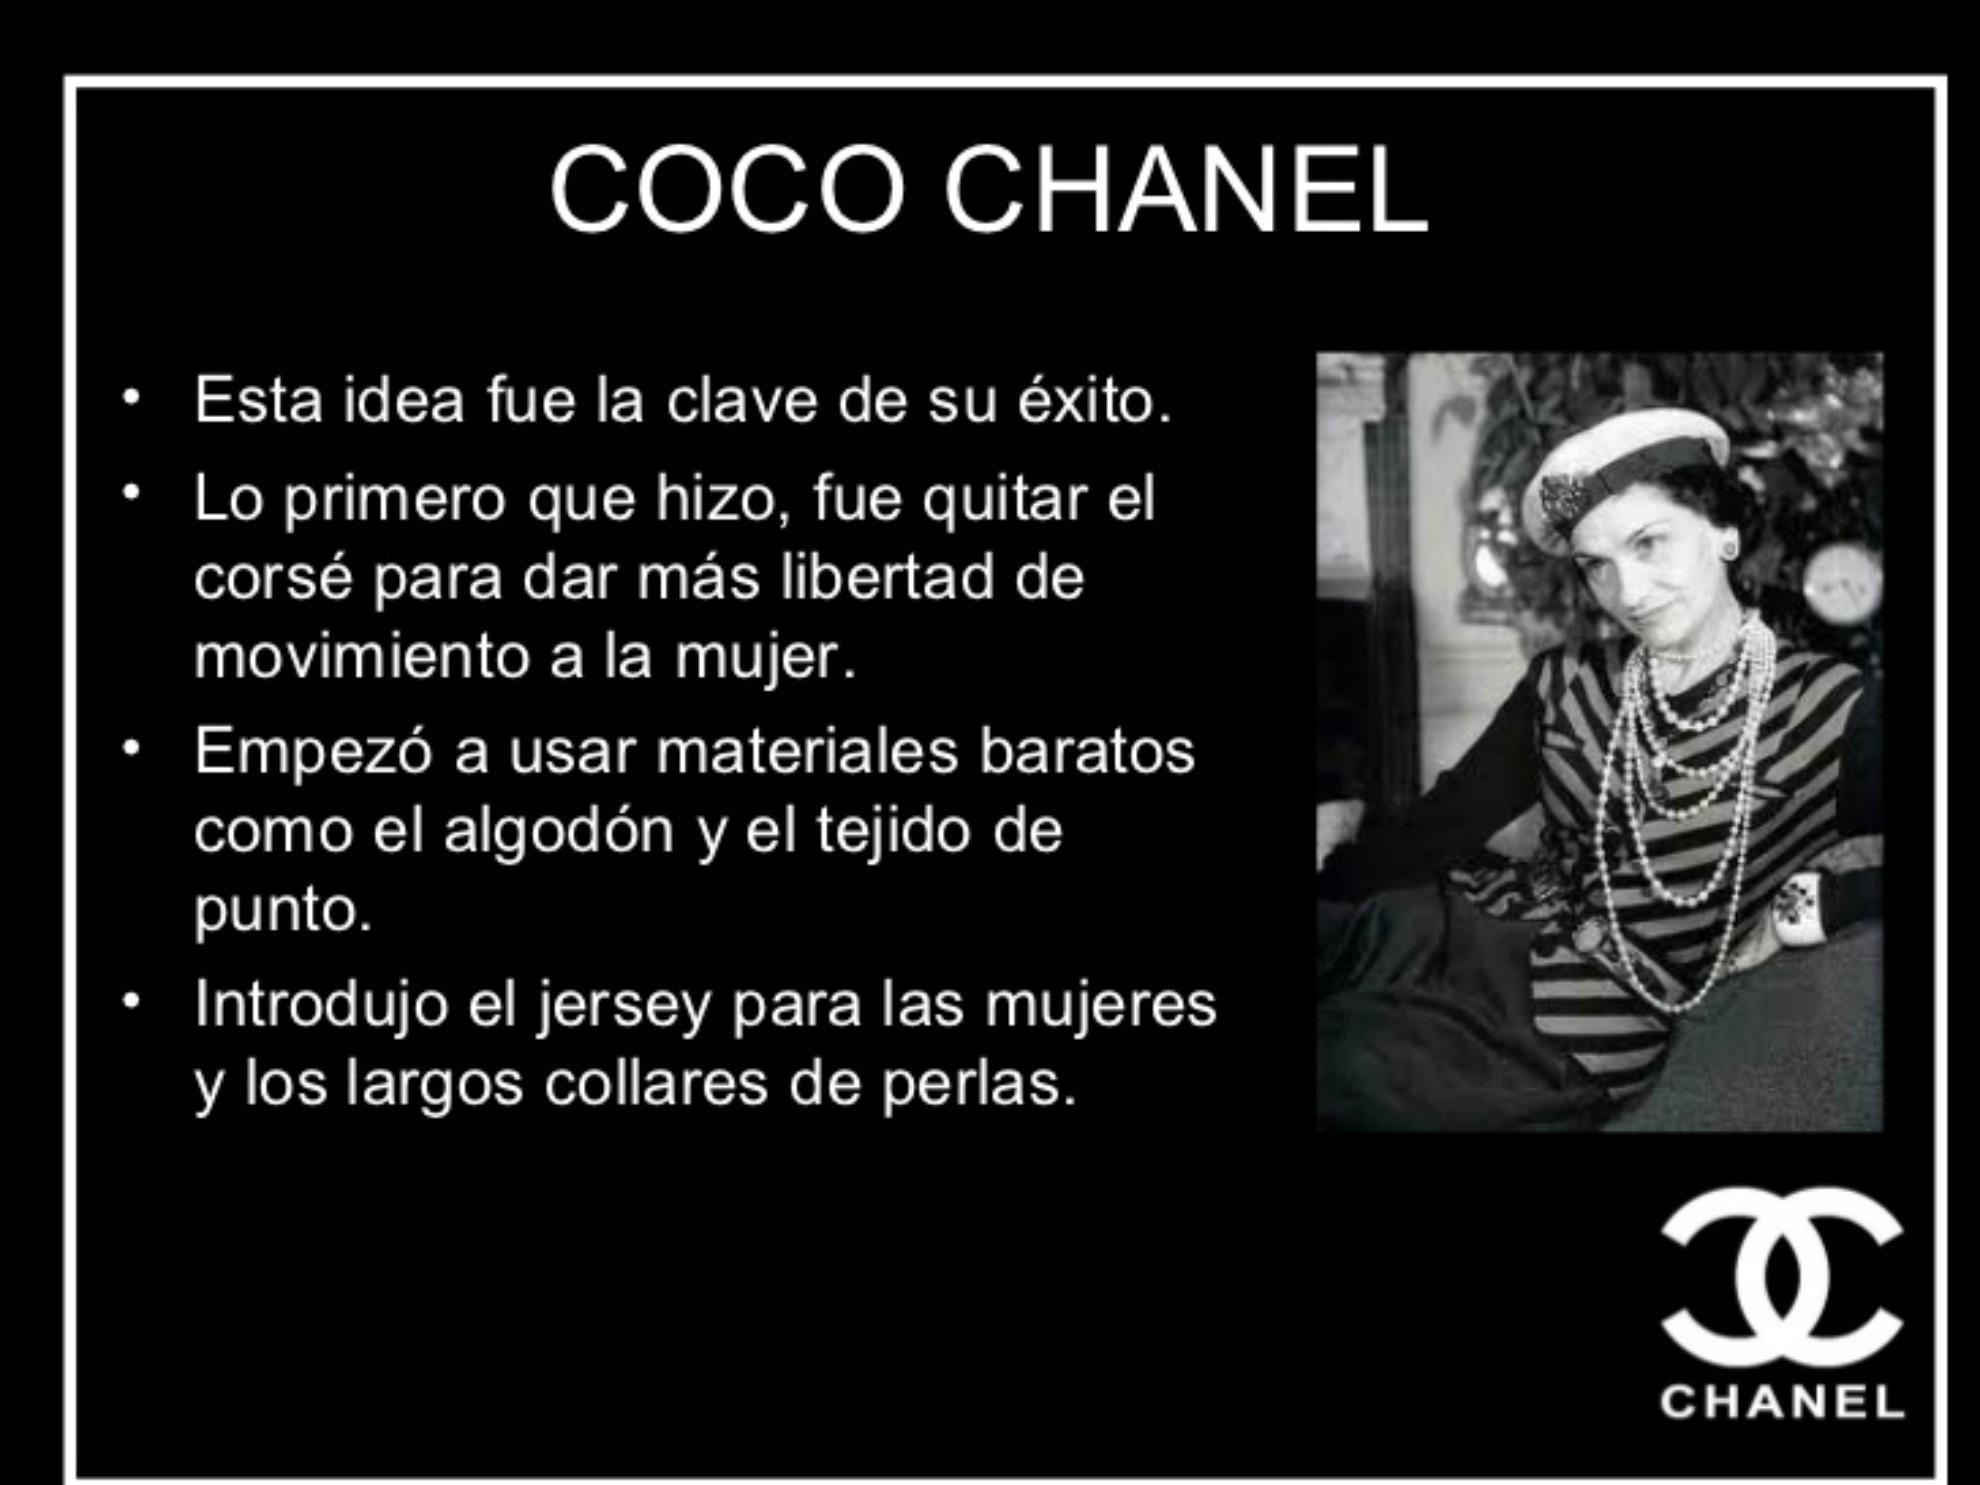 0coco-chanel-10-728